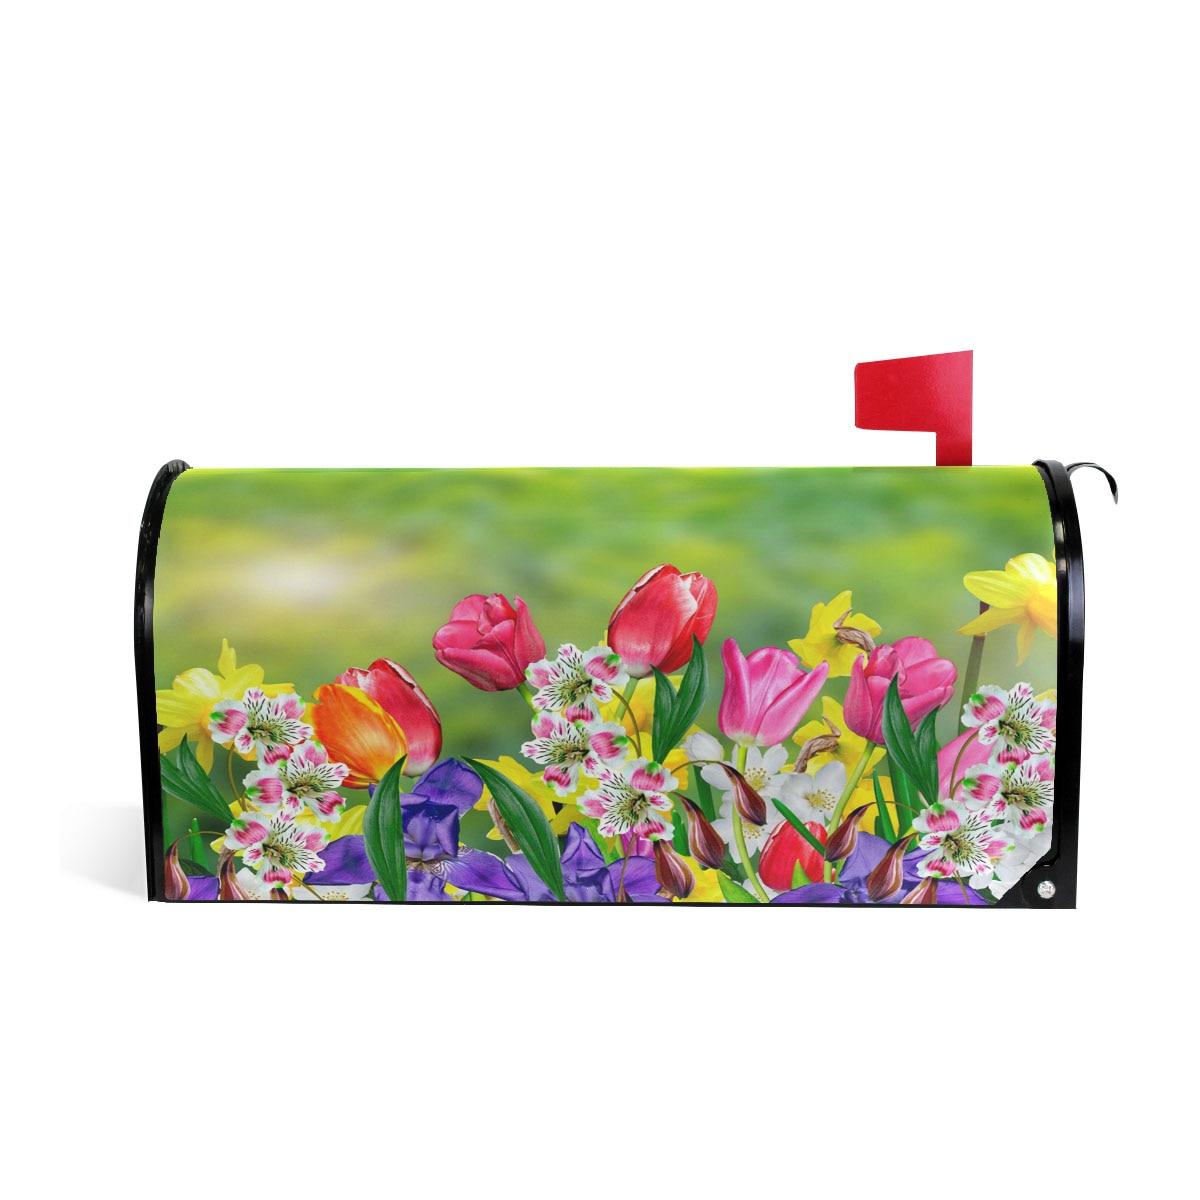 Custom Decor Sunflowers /& Birds Magnetic Mailbox Wrap Cover